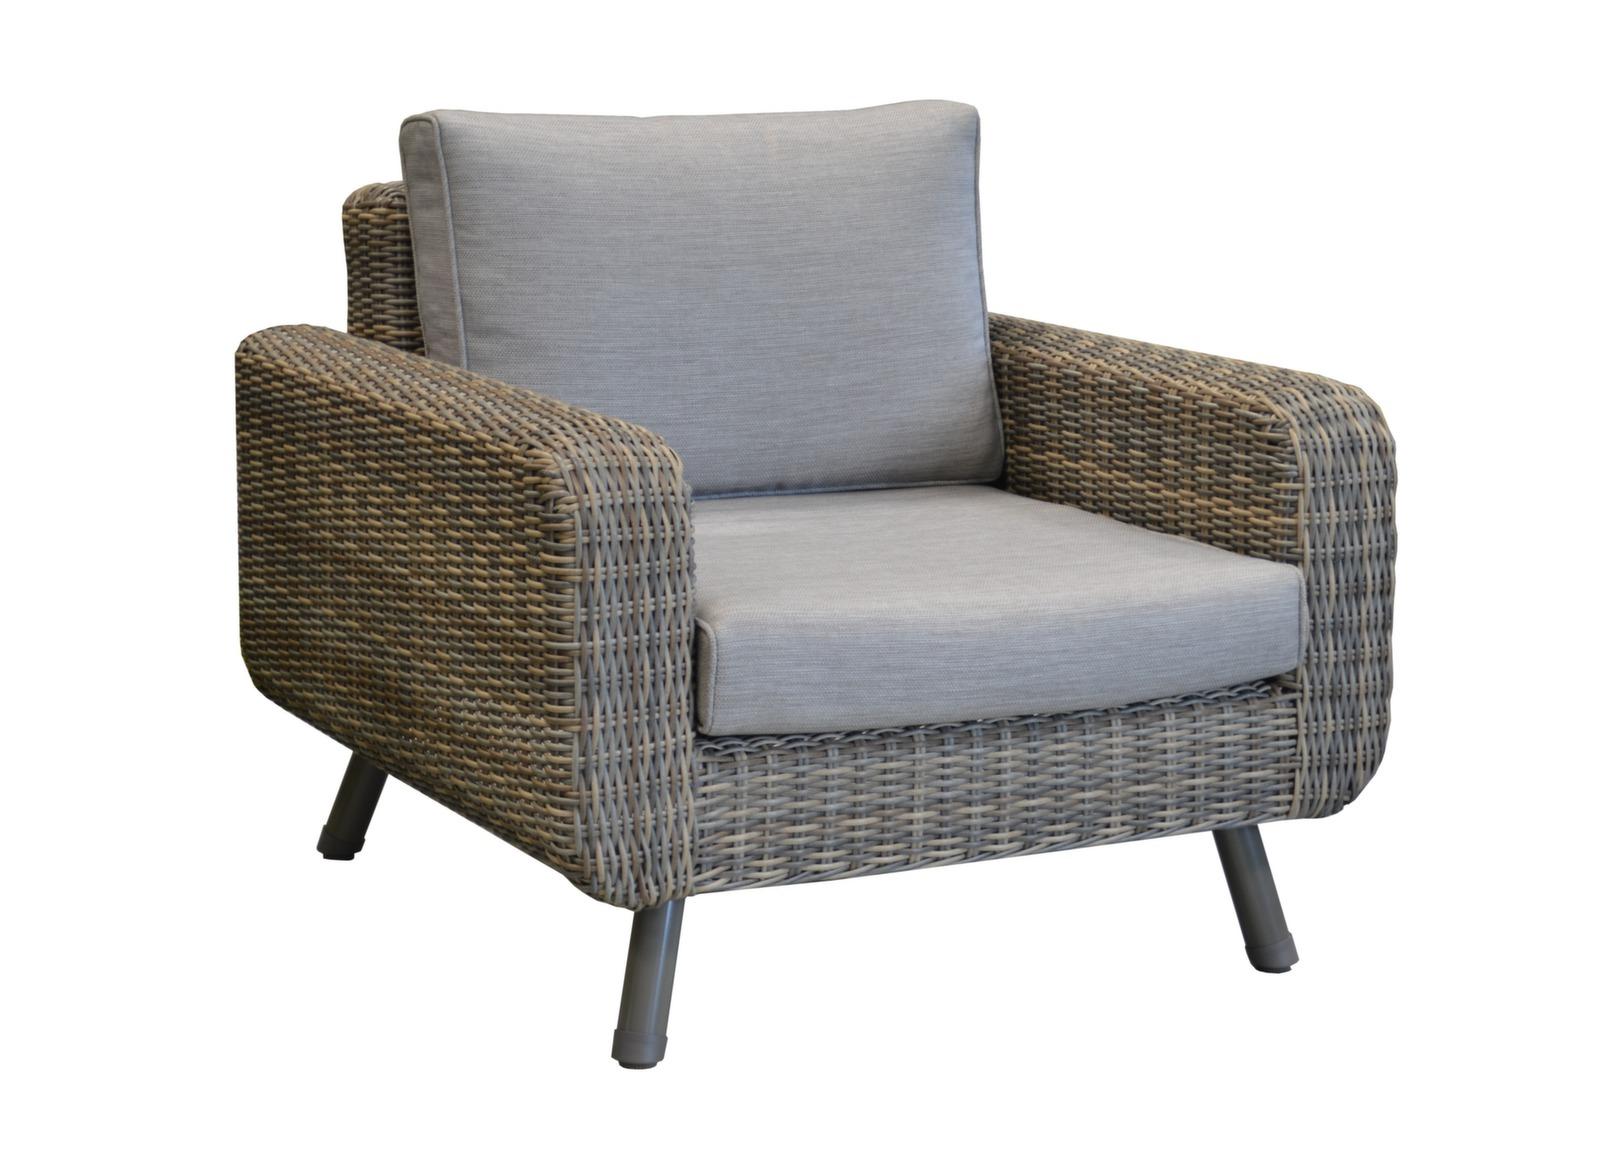 fauteuil de jardin r sine tress e vigo gamme oc o proloisirs. Black Bedroom Furniture Sets. Home Design Ideas